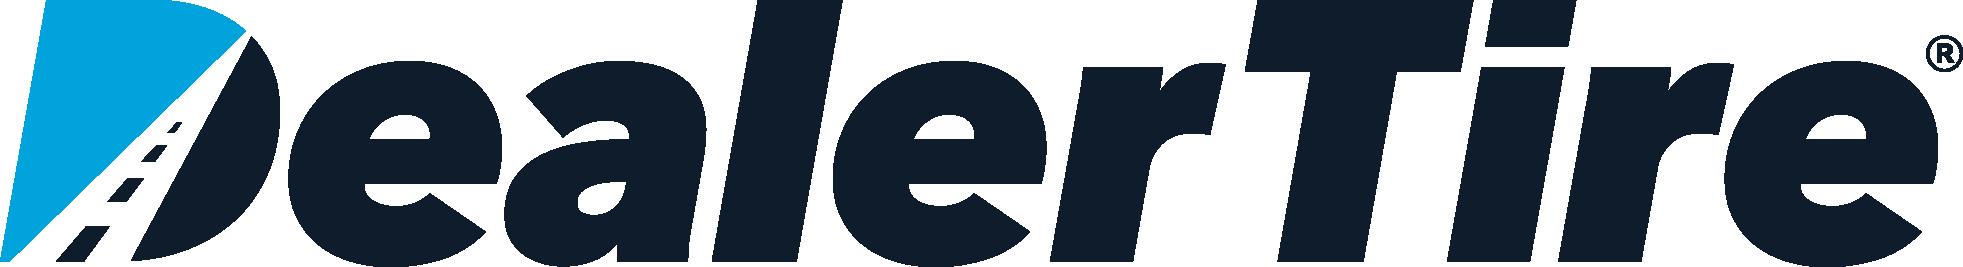 Dealer Tire, LLC logo